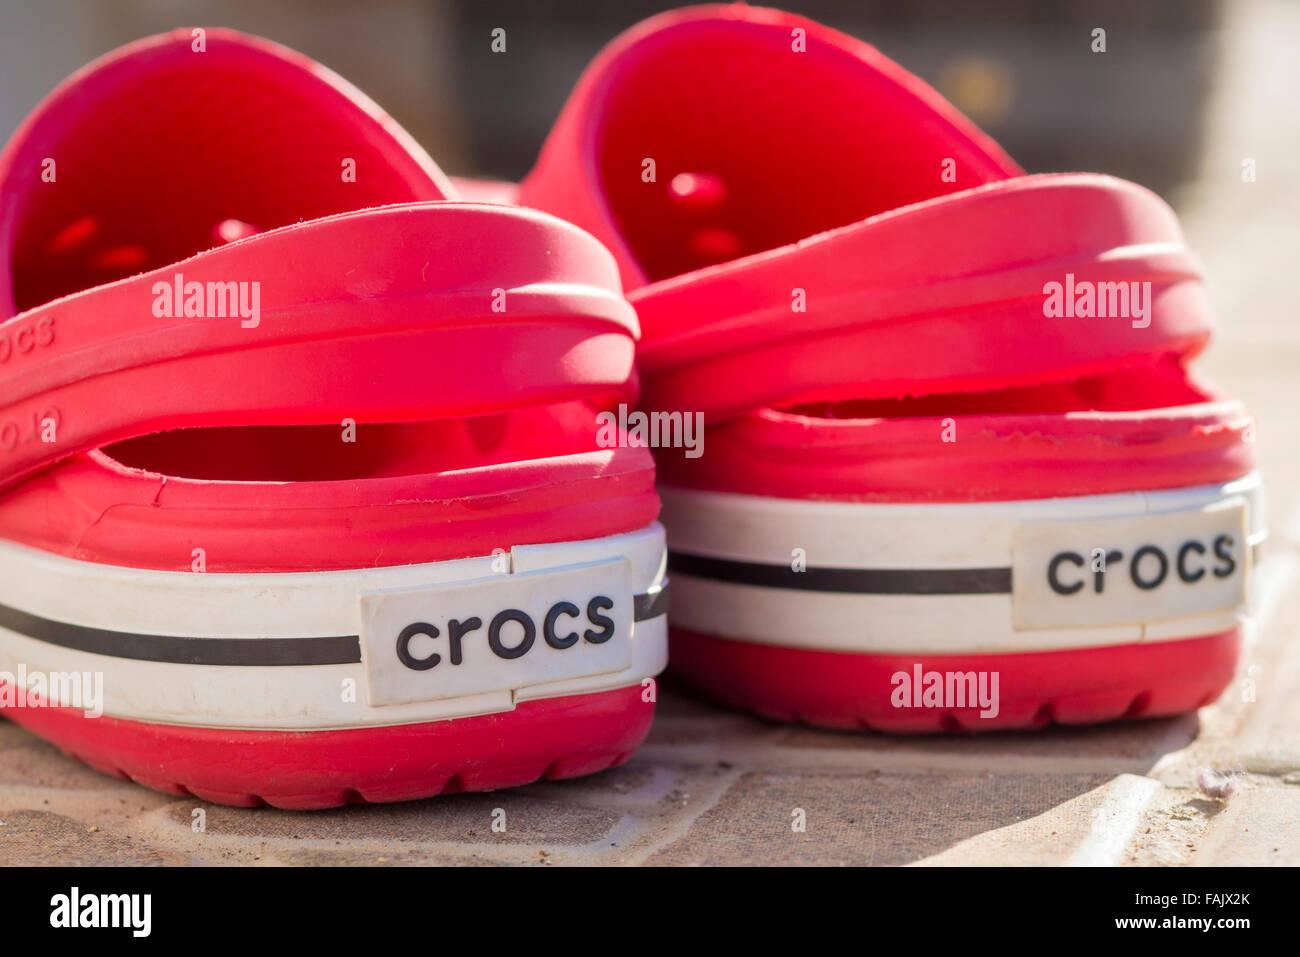 2707c3add Crocs Shoes Stock Photos   Crocs Shoes Stock Images - Page 3 - Alamy